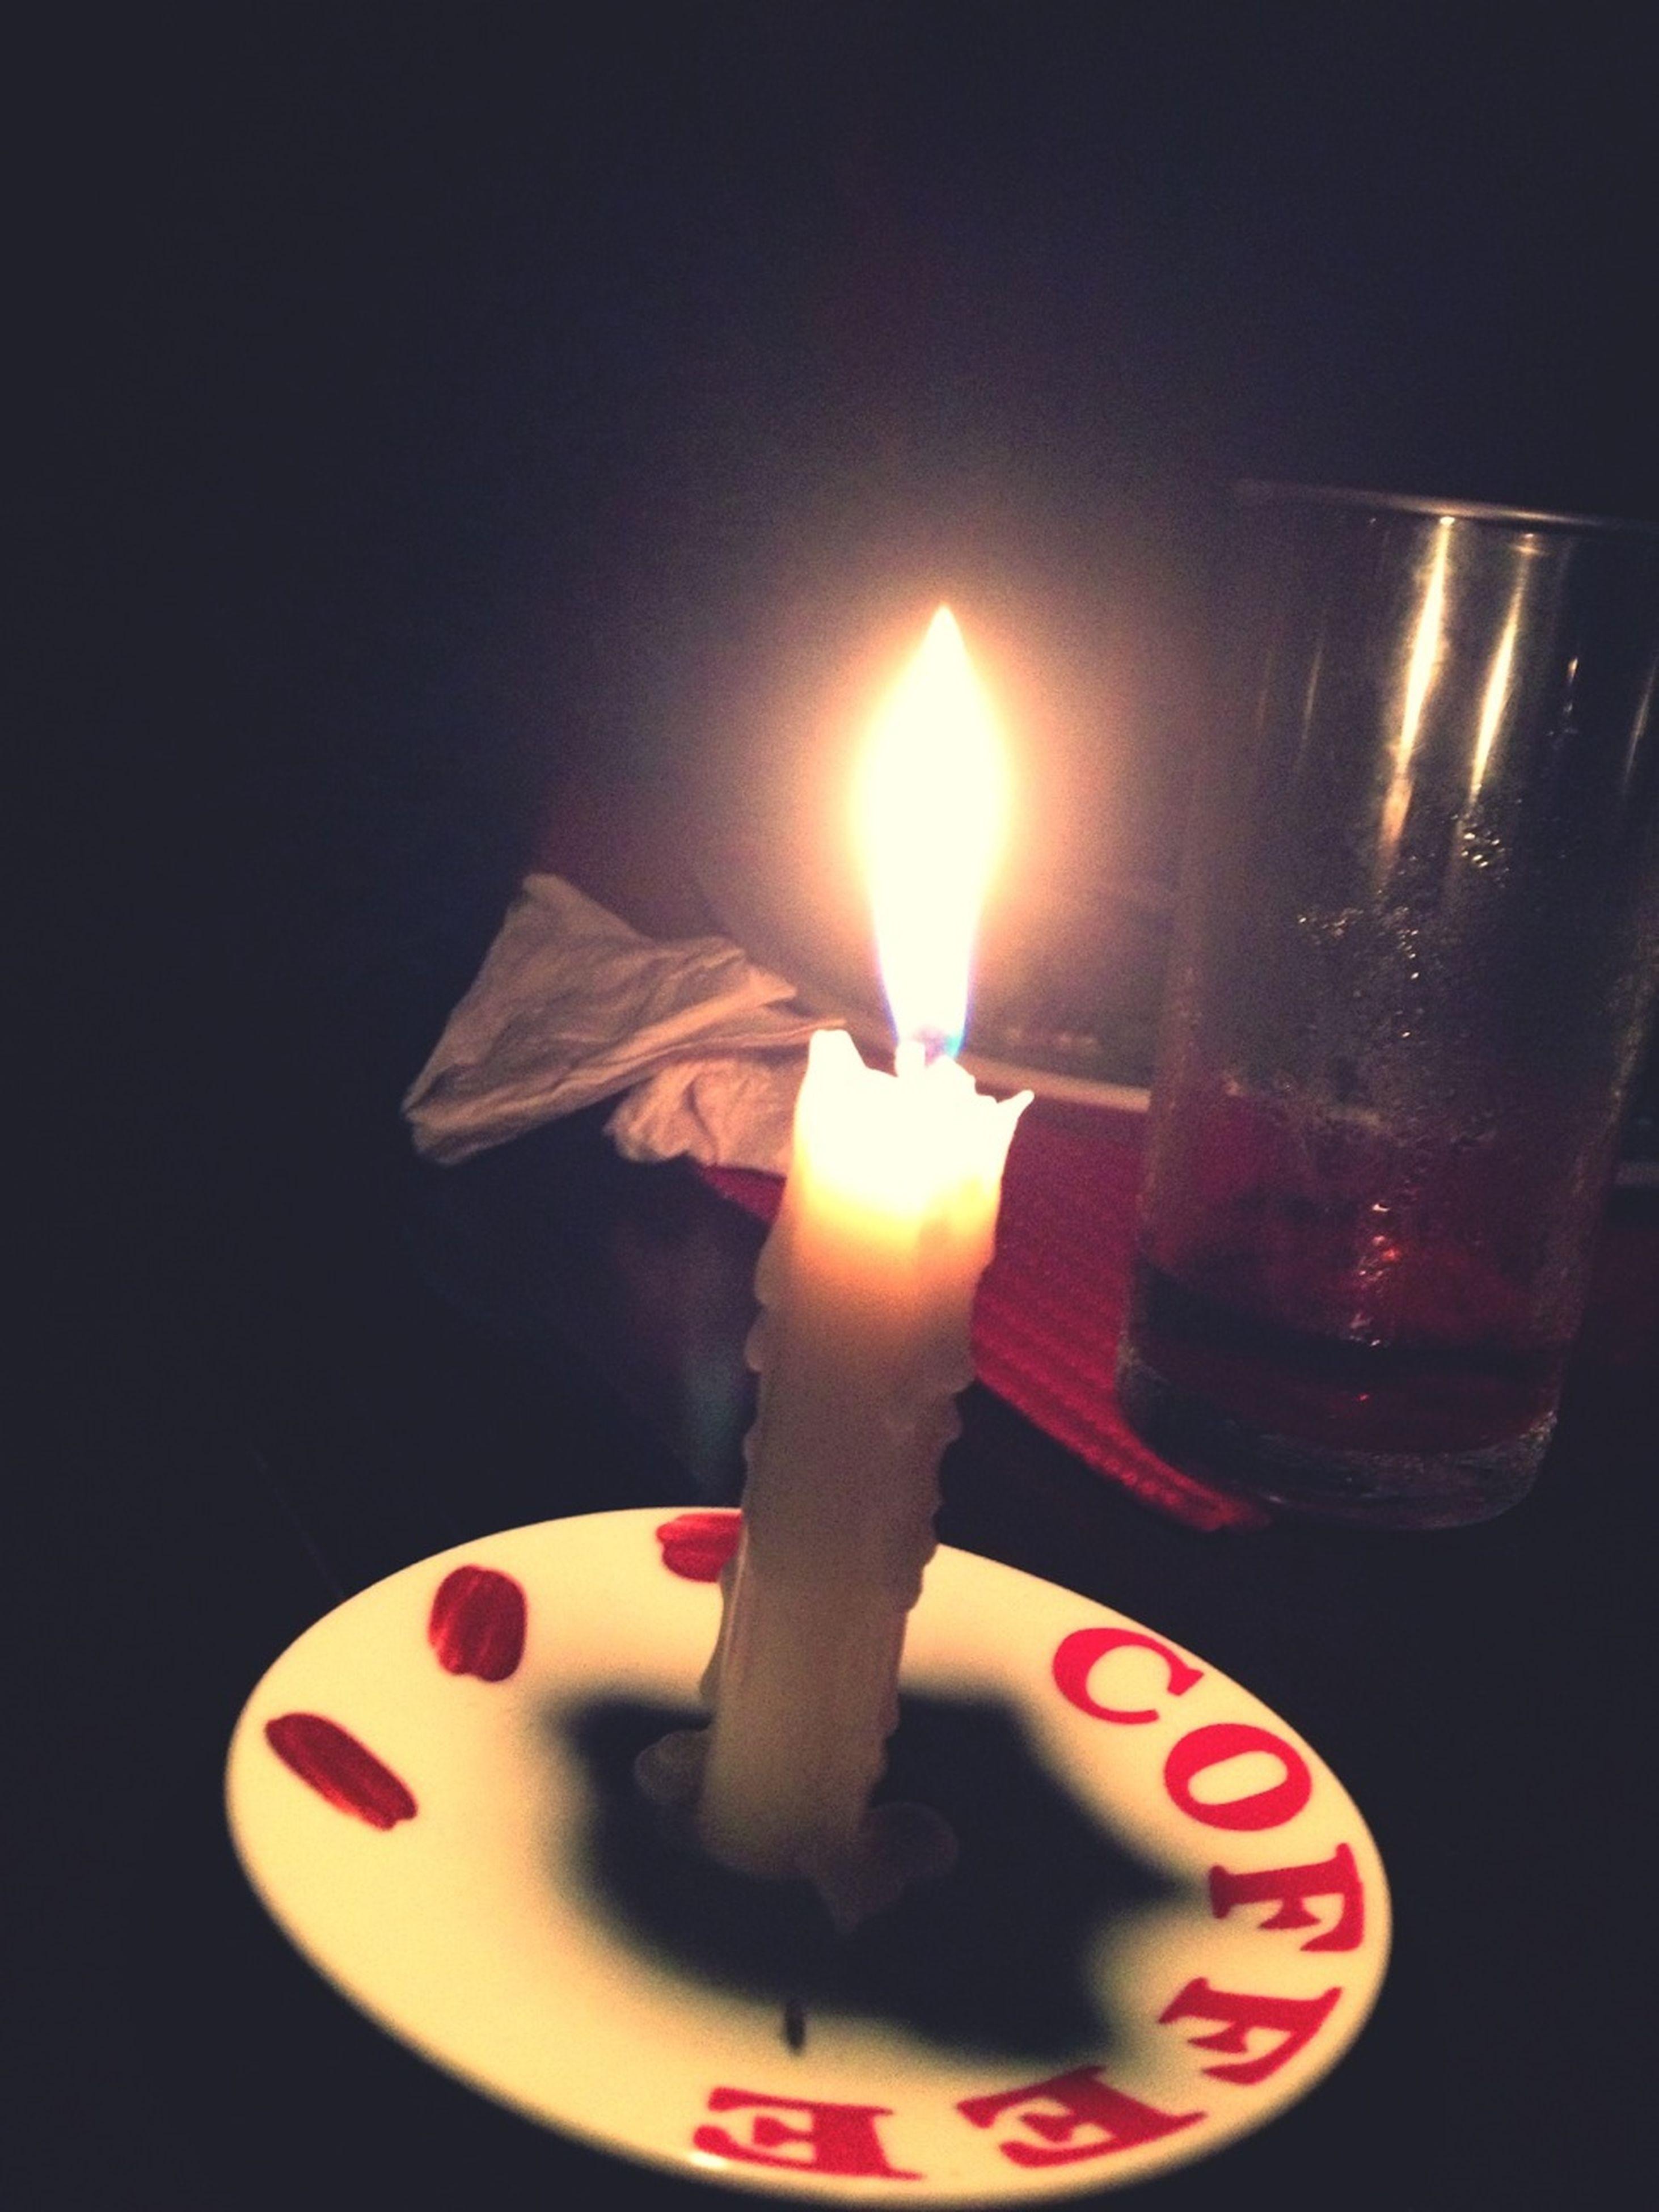 candle, indoors, flame, burning, illuminated, close-up, glowing, heat - temperature, lit, candlelight, fire - natural phenomenon, studio shot, still life, tea light, lighting equipment, black background, darkroom, single object, dark, fire